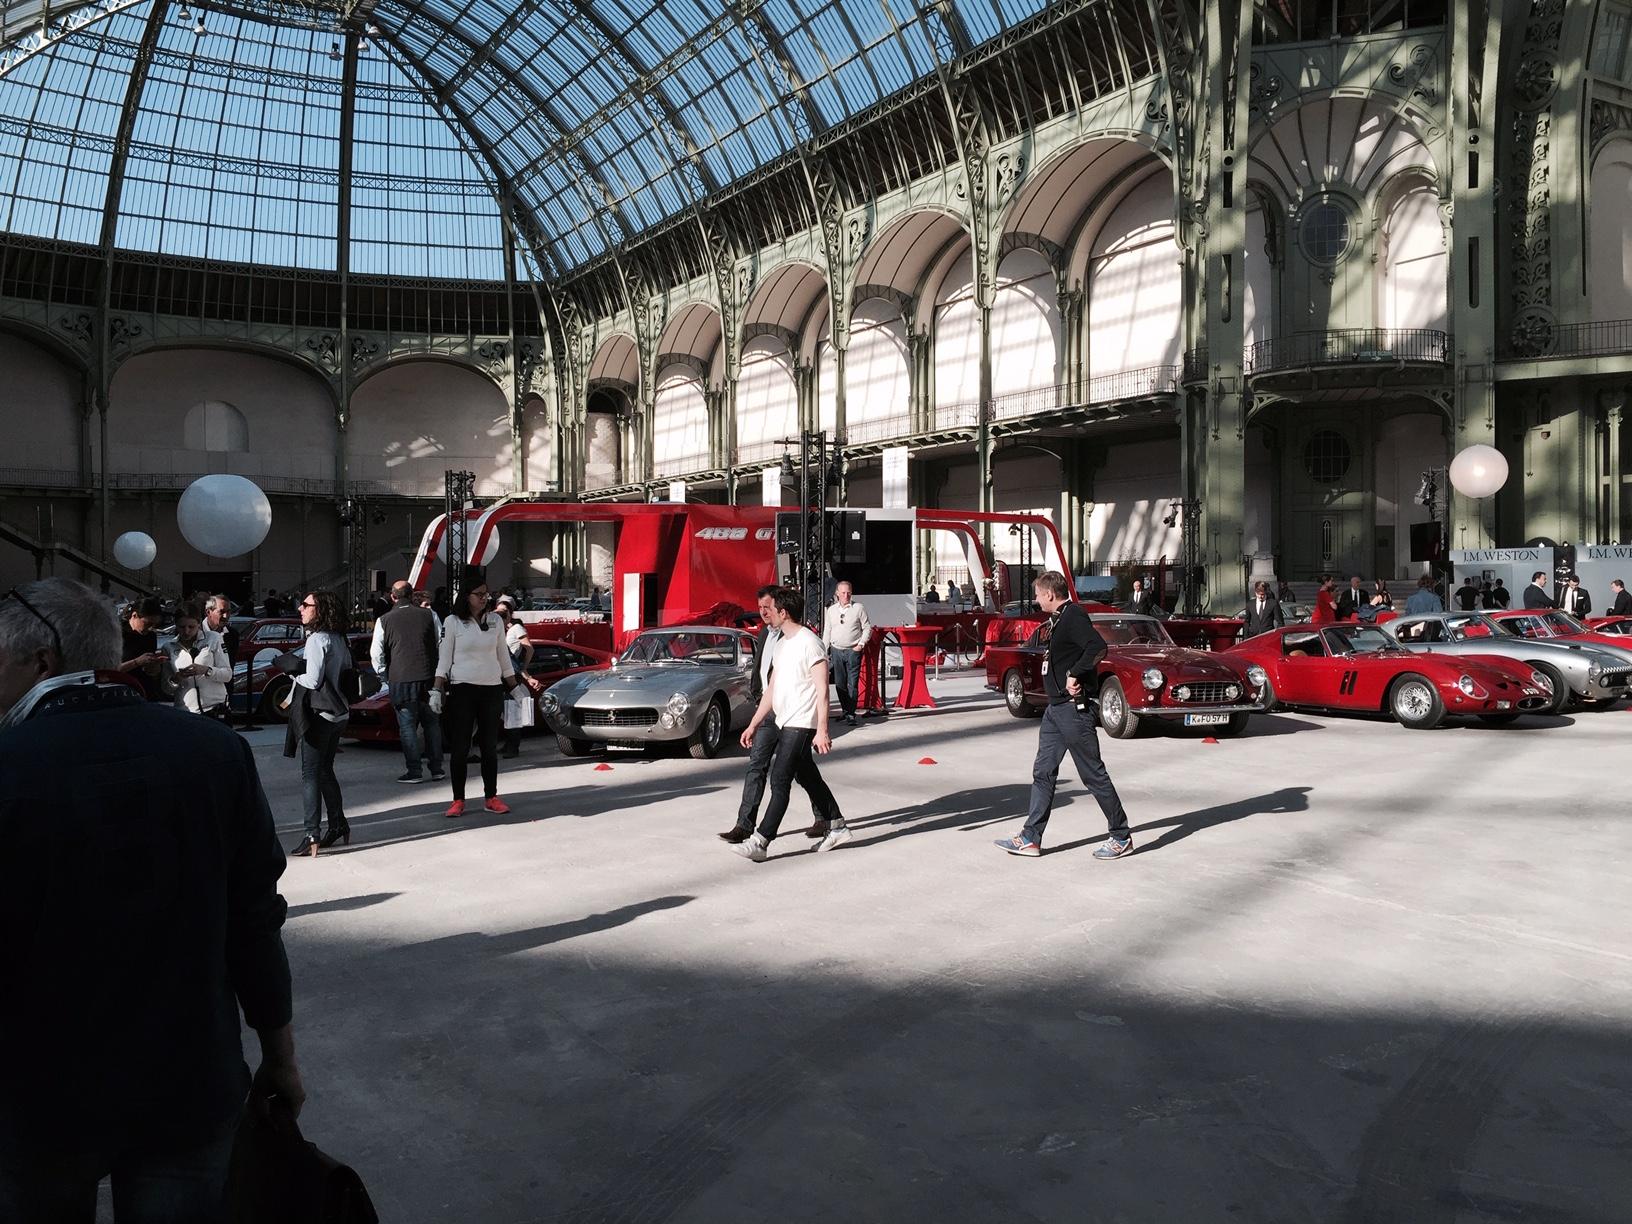 An awesome car park, the Grand Palais Paris